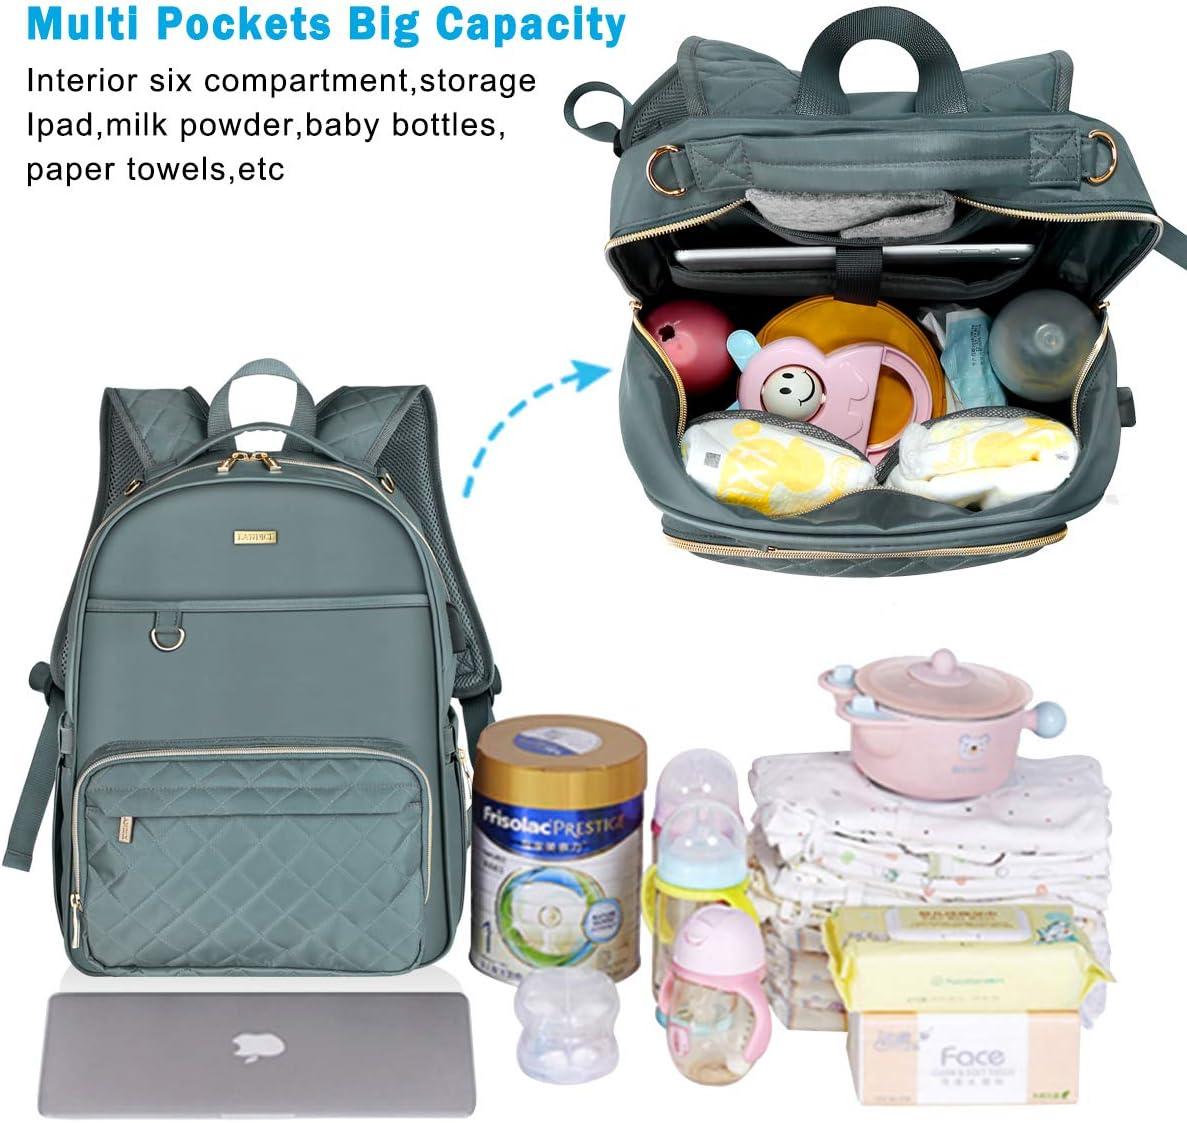 Landici Baby Changing Bag Backpack,Waterproof Large Capacity Travel Diaper Bag Back Pack Multi-Function Maternity Rucksack Nappy Bag with Changing Mat/&Stroller Strap/&USB Port for Mom /& Women-Black